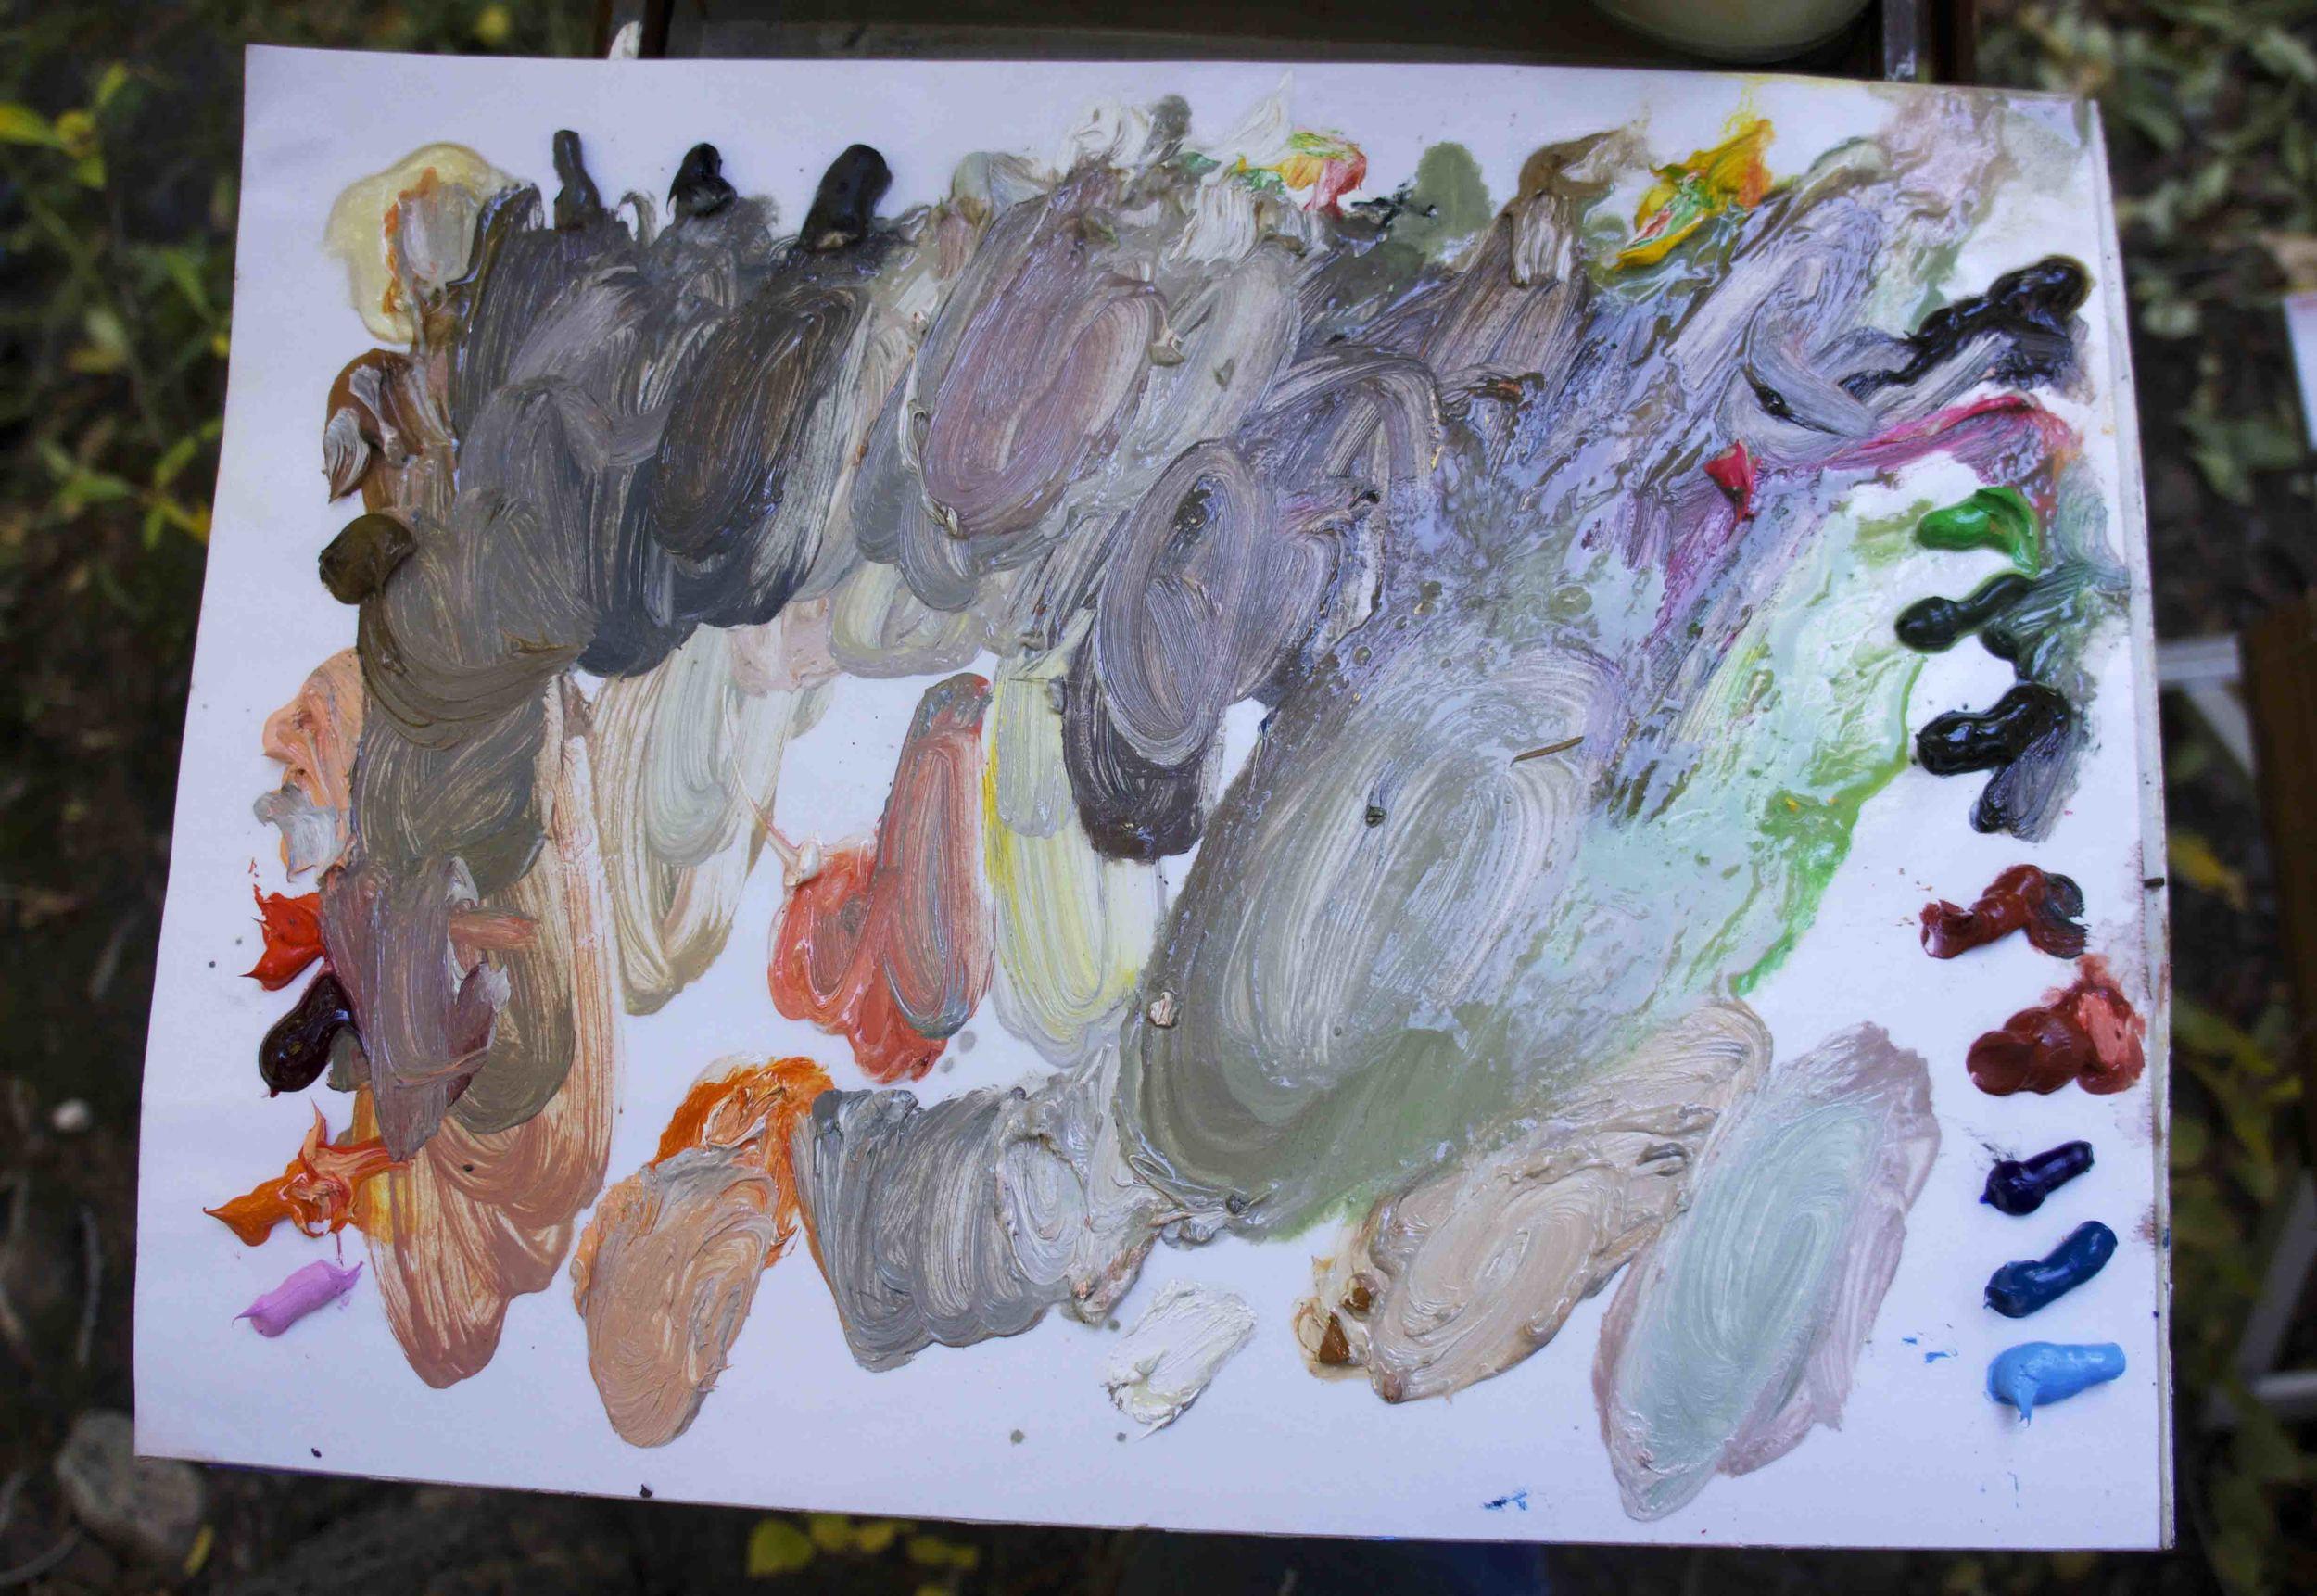 site-10.3.13 RAW-n. crestone creek palette.jpg